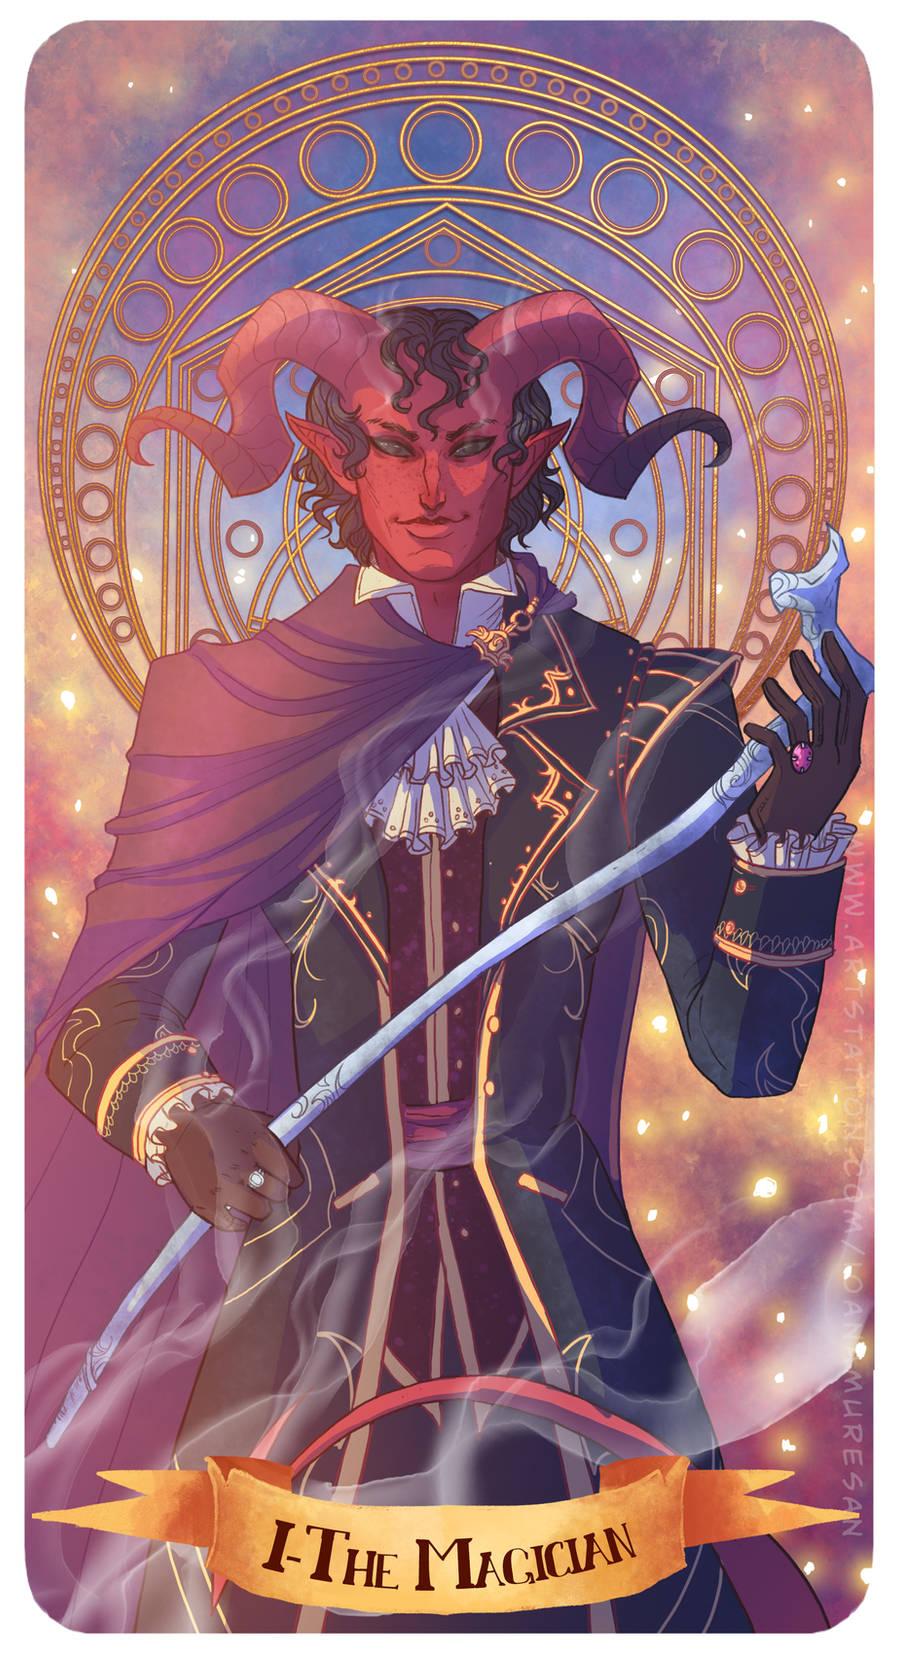 The magician by Ioana-Muresan